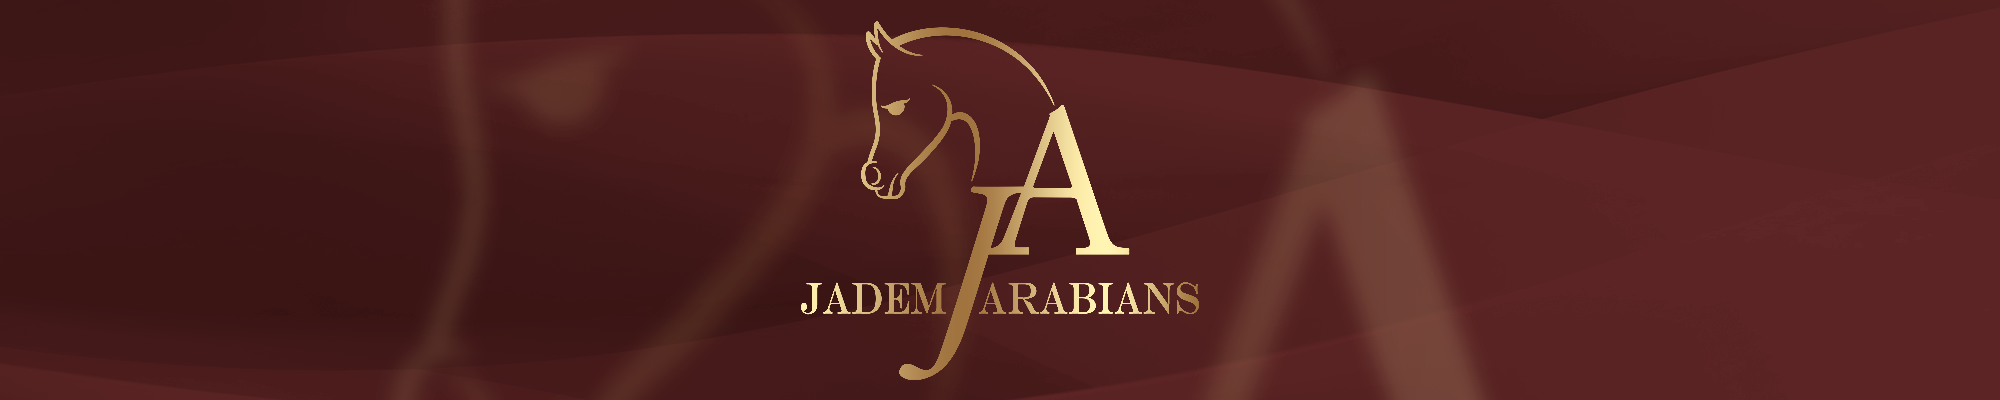 Jadem-arabians